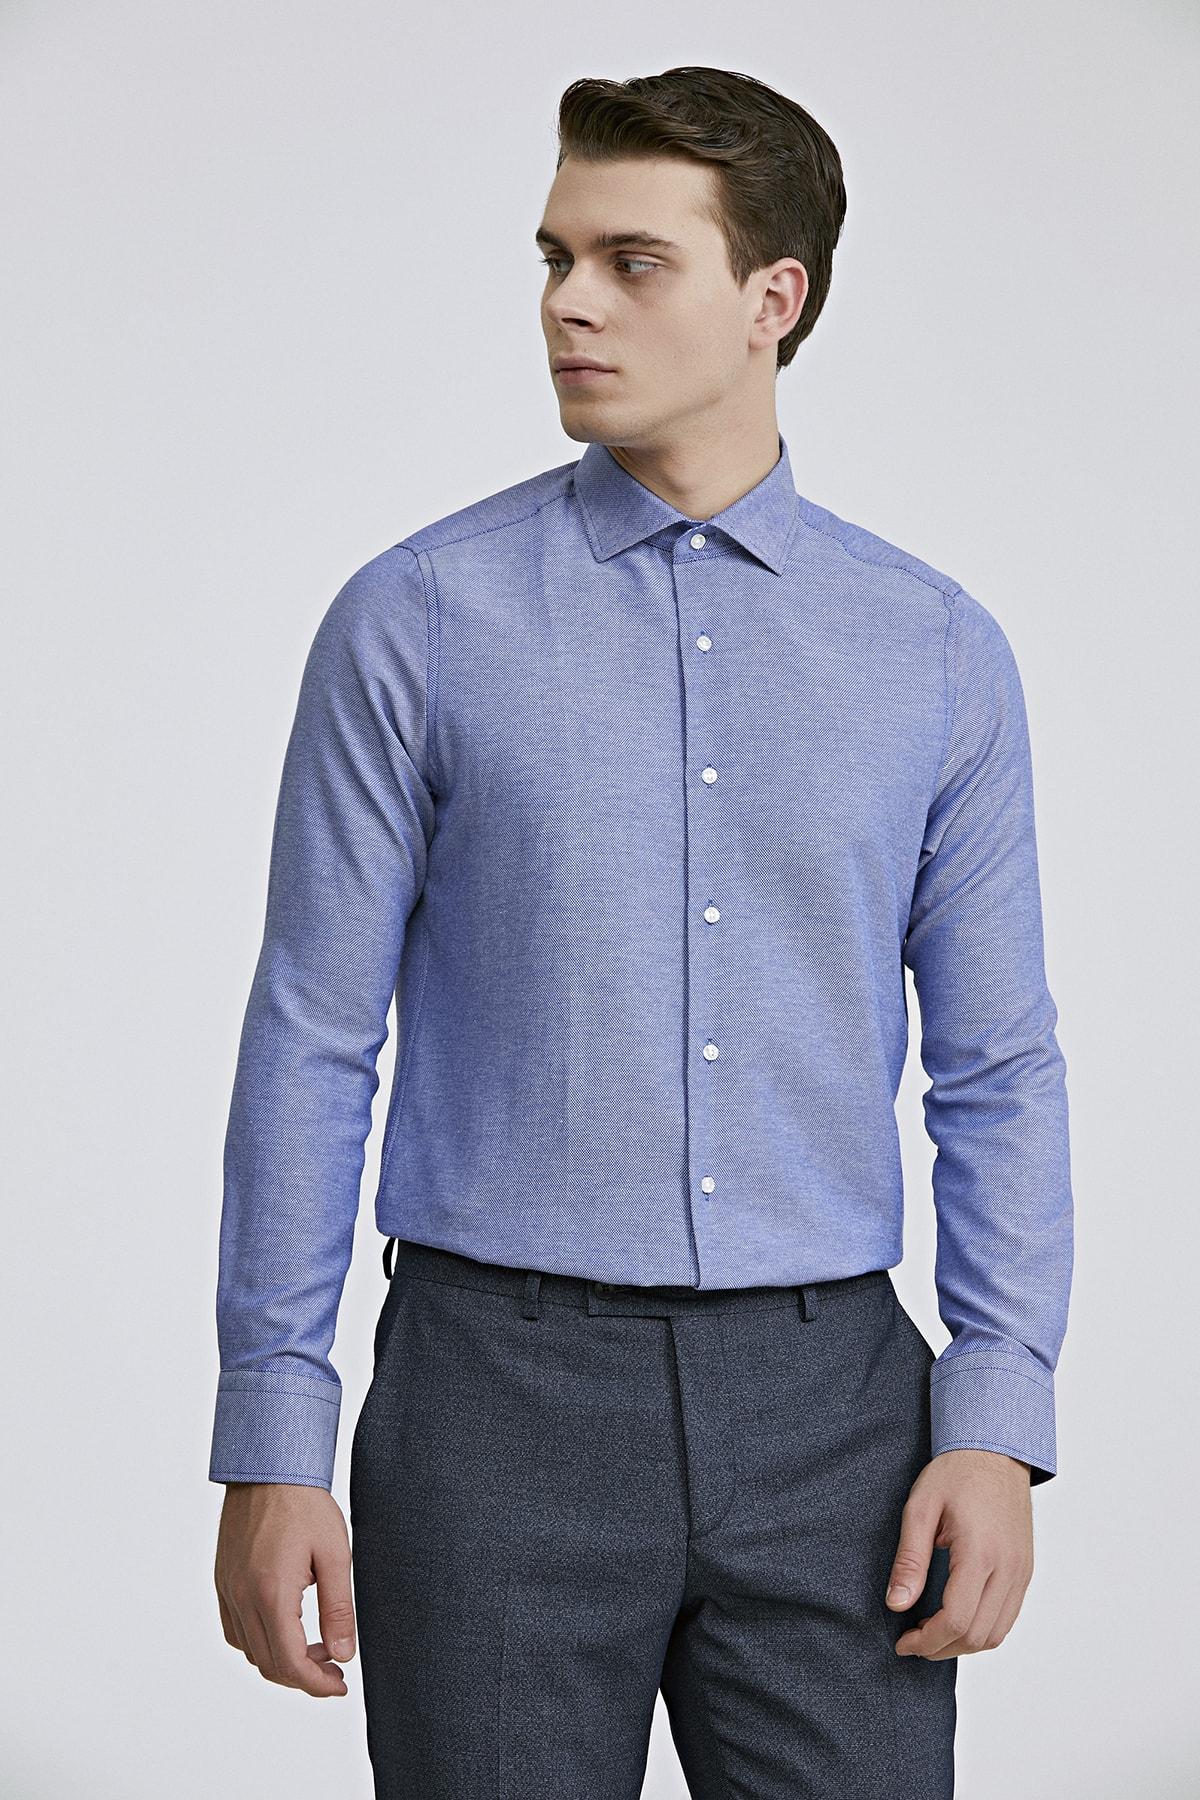 Slim Fit Mavi Renk Erkek Gömlek 2HF02ORT3185_702